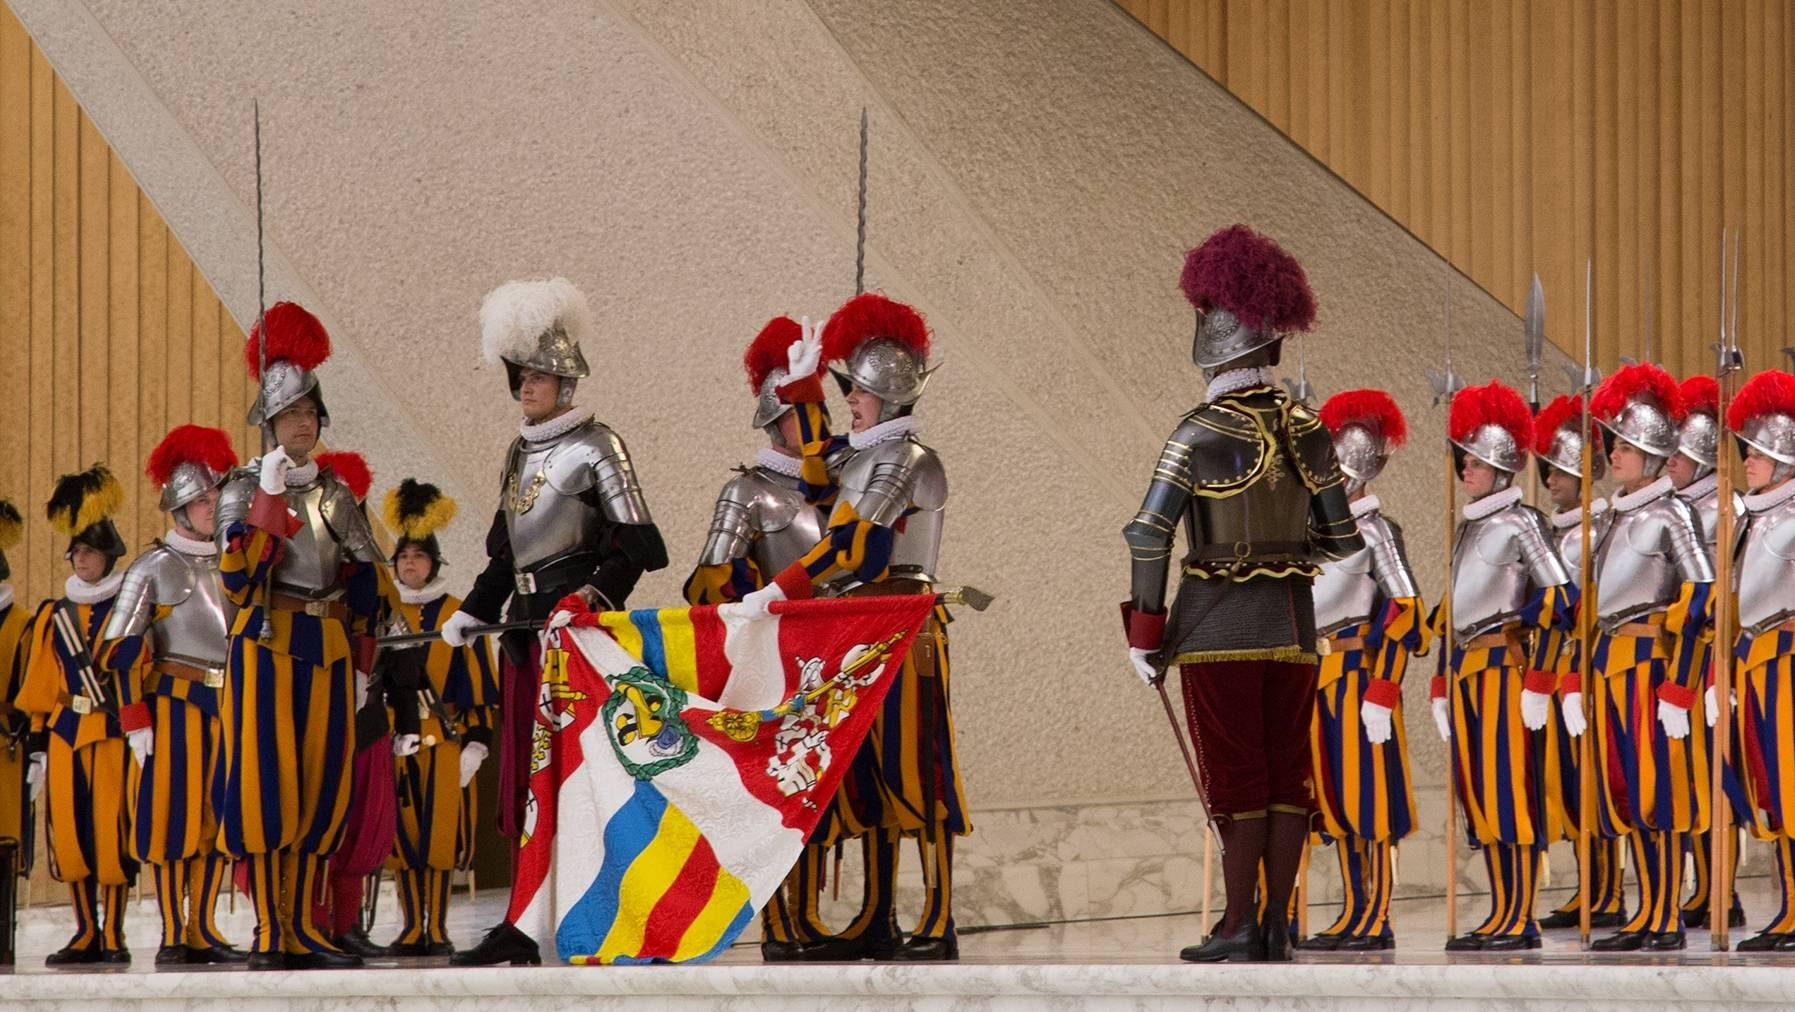 gardes-suisses-serment-vatican